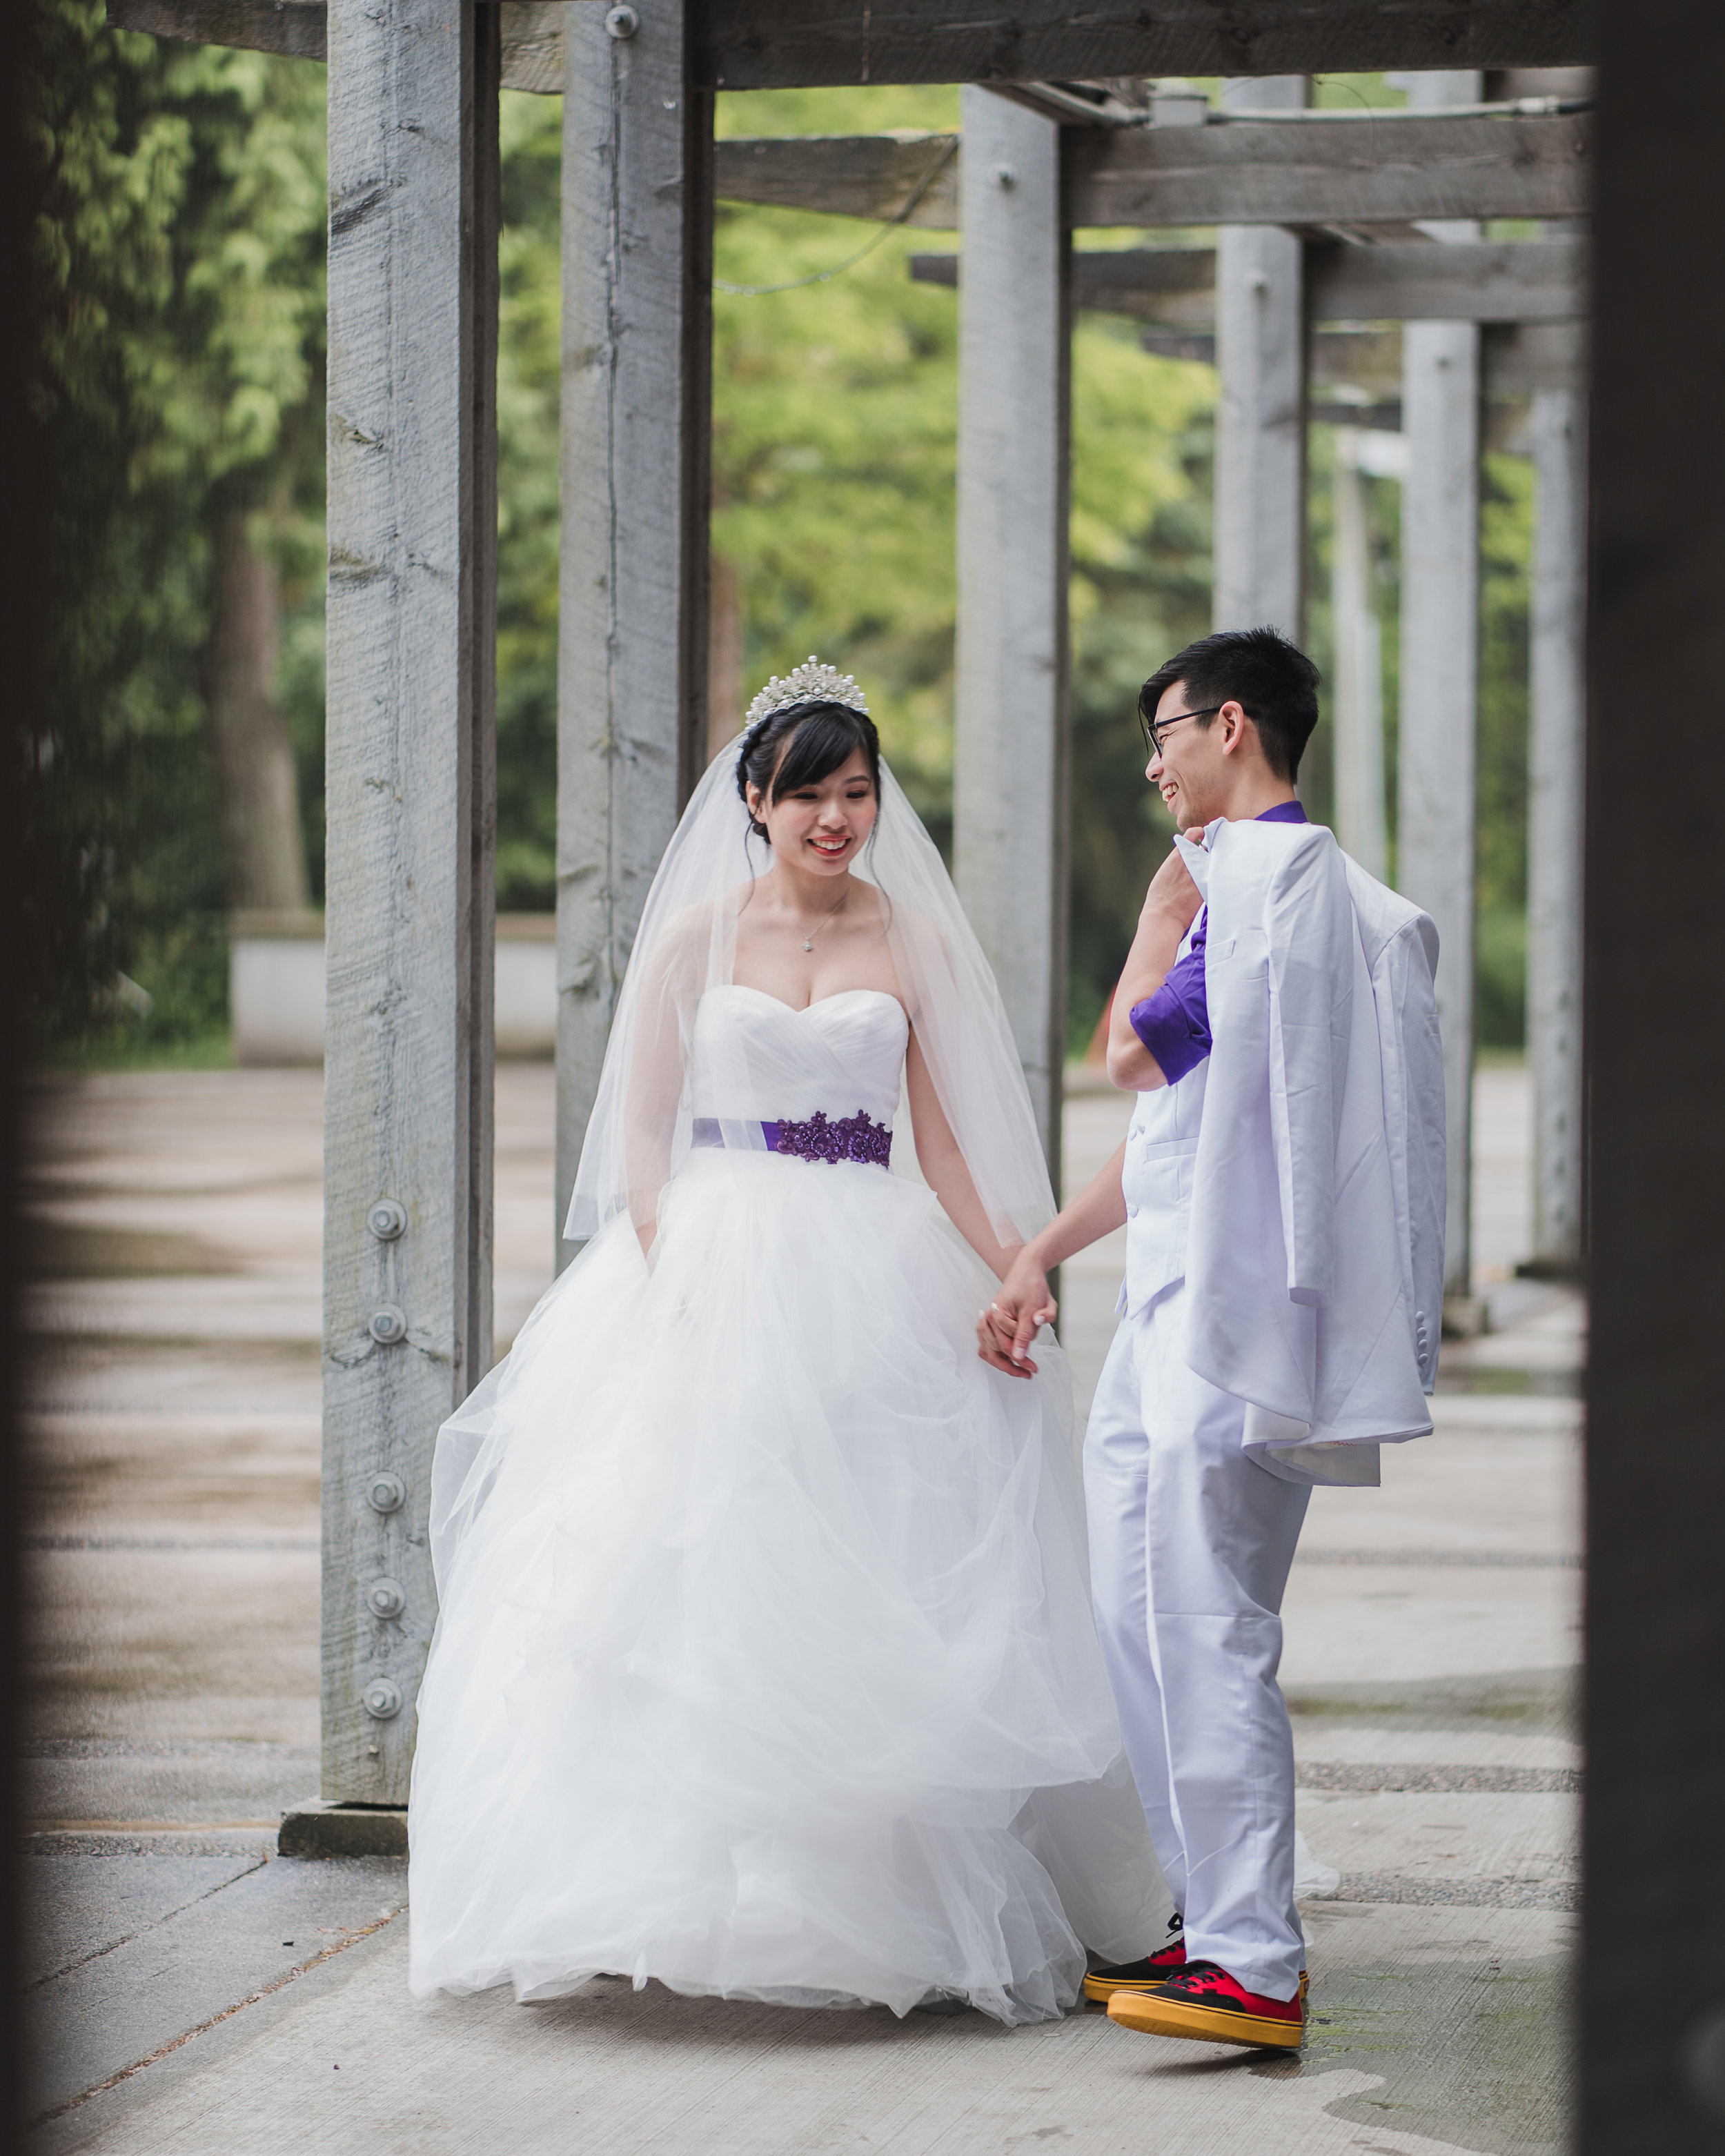 20190520 - Pamela & Matthew Wedding - 0194.jpg